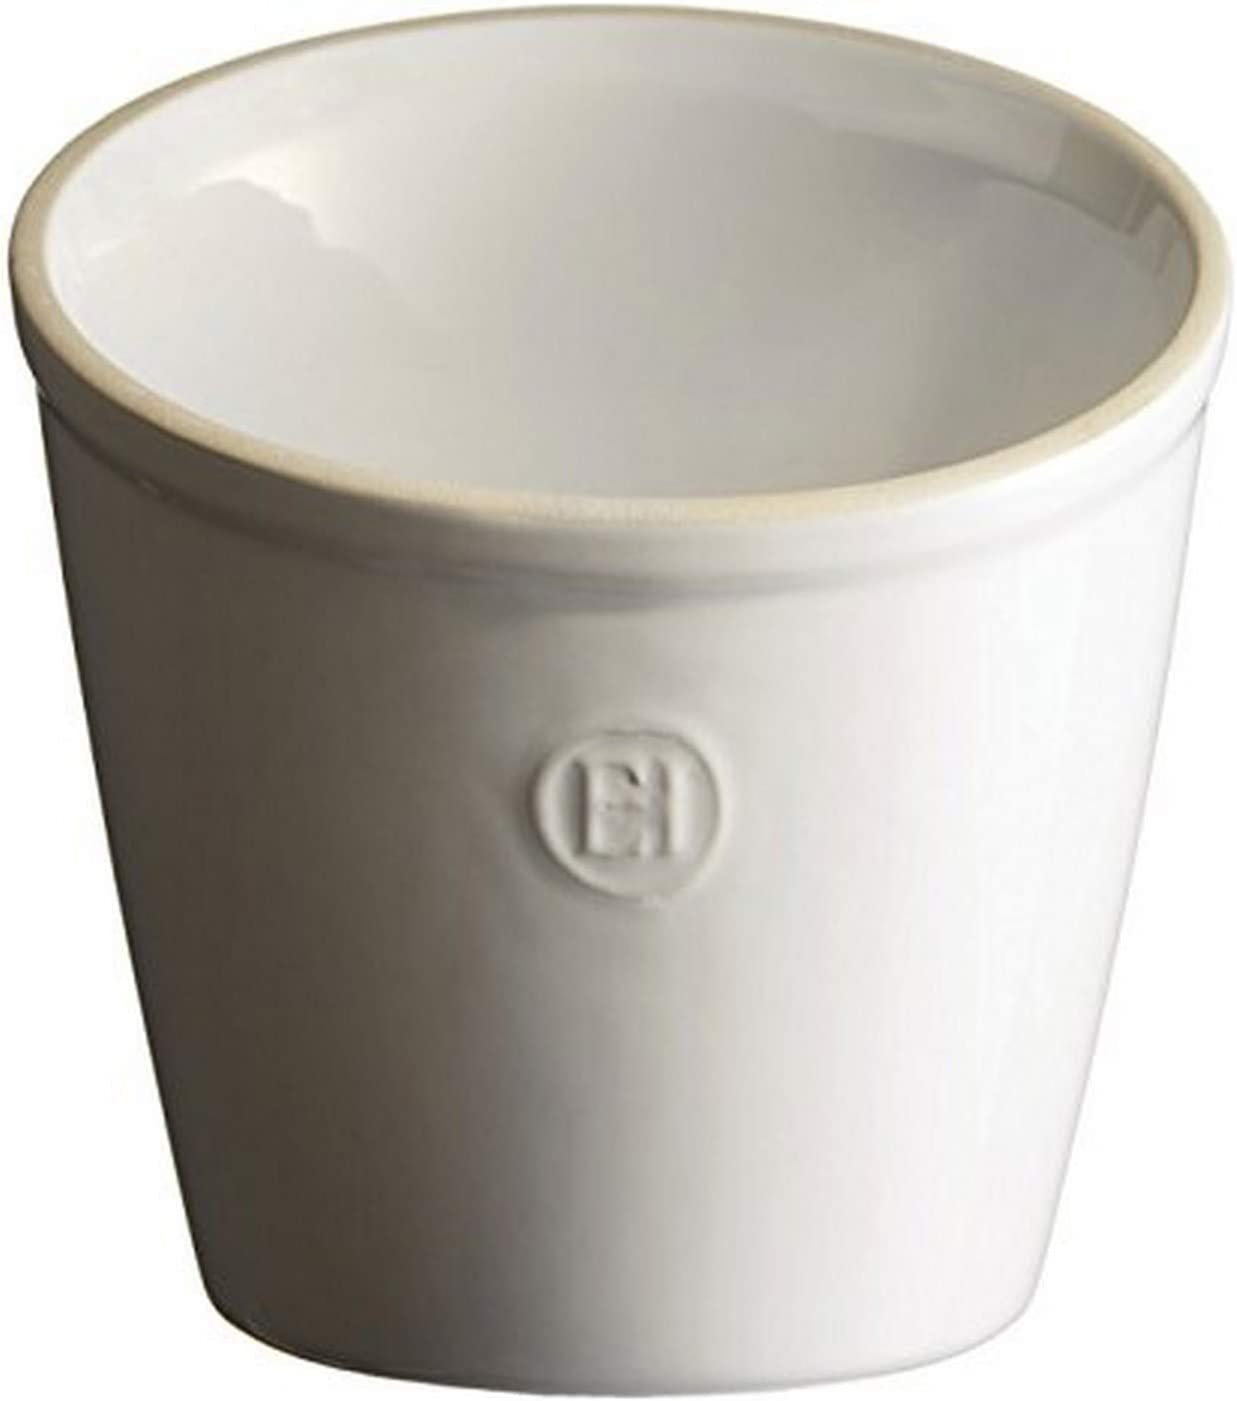 Emile Spring new work Henry Made In France Utensil Fixed price for sale Flour Pot Whi Holder